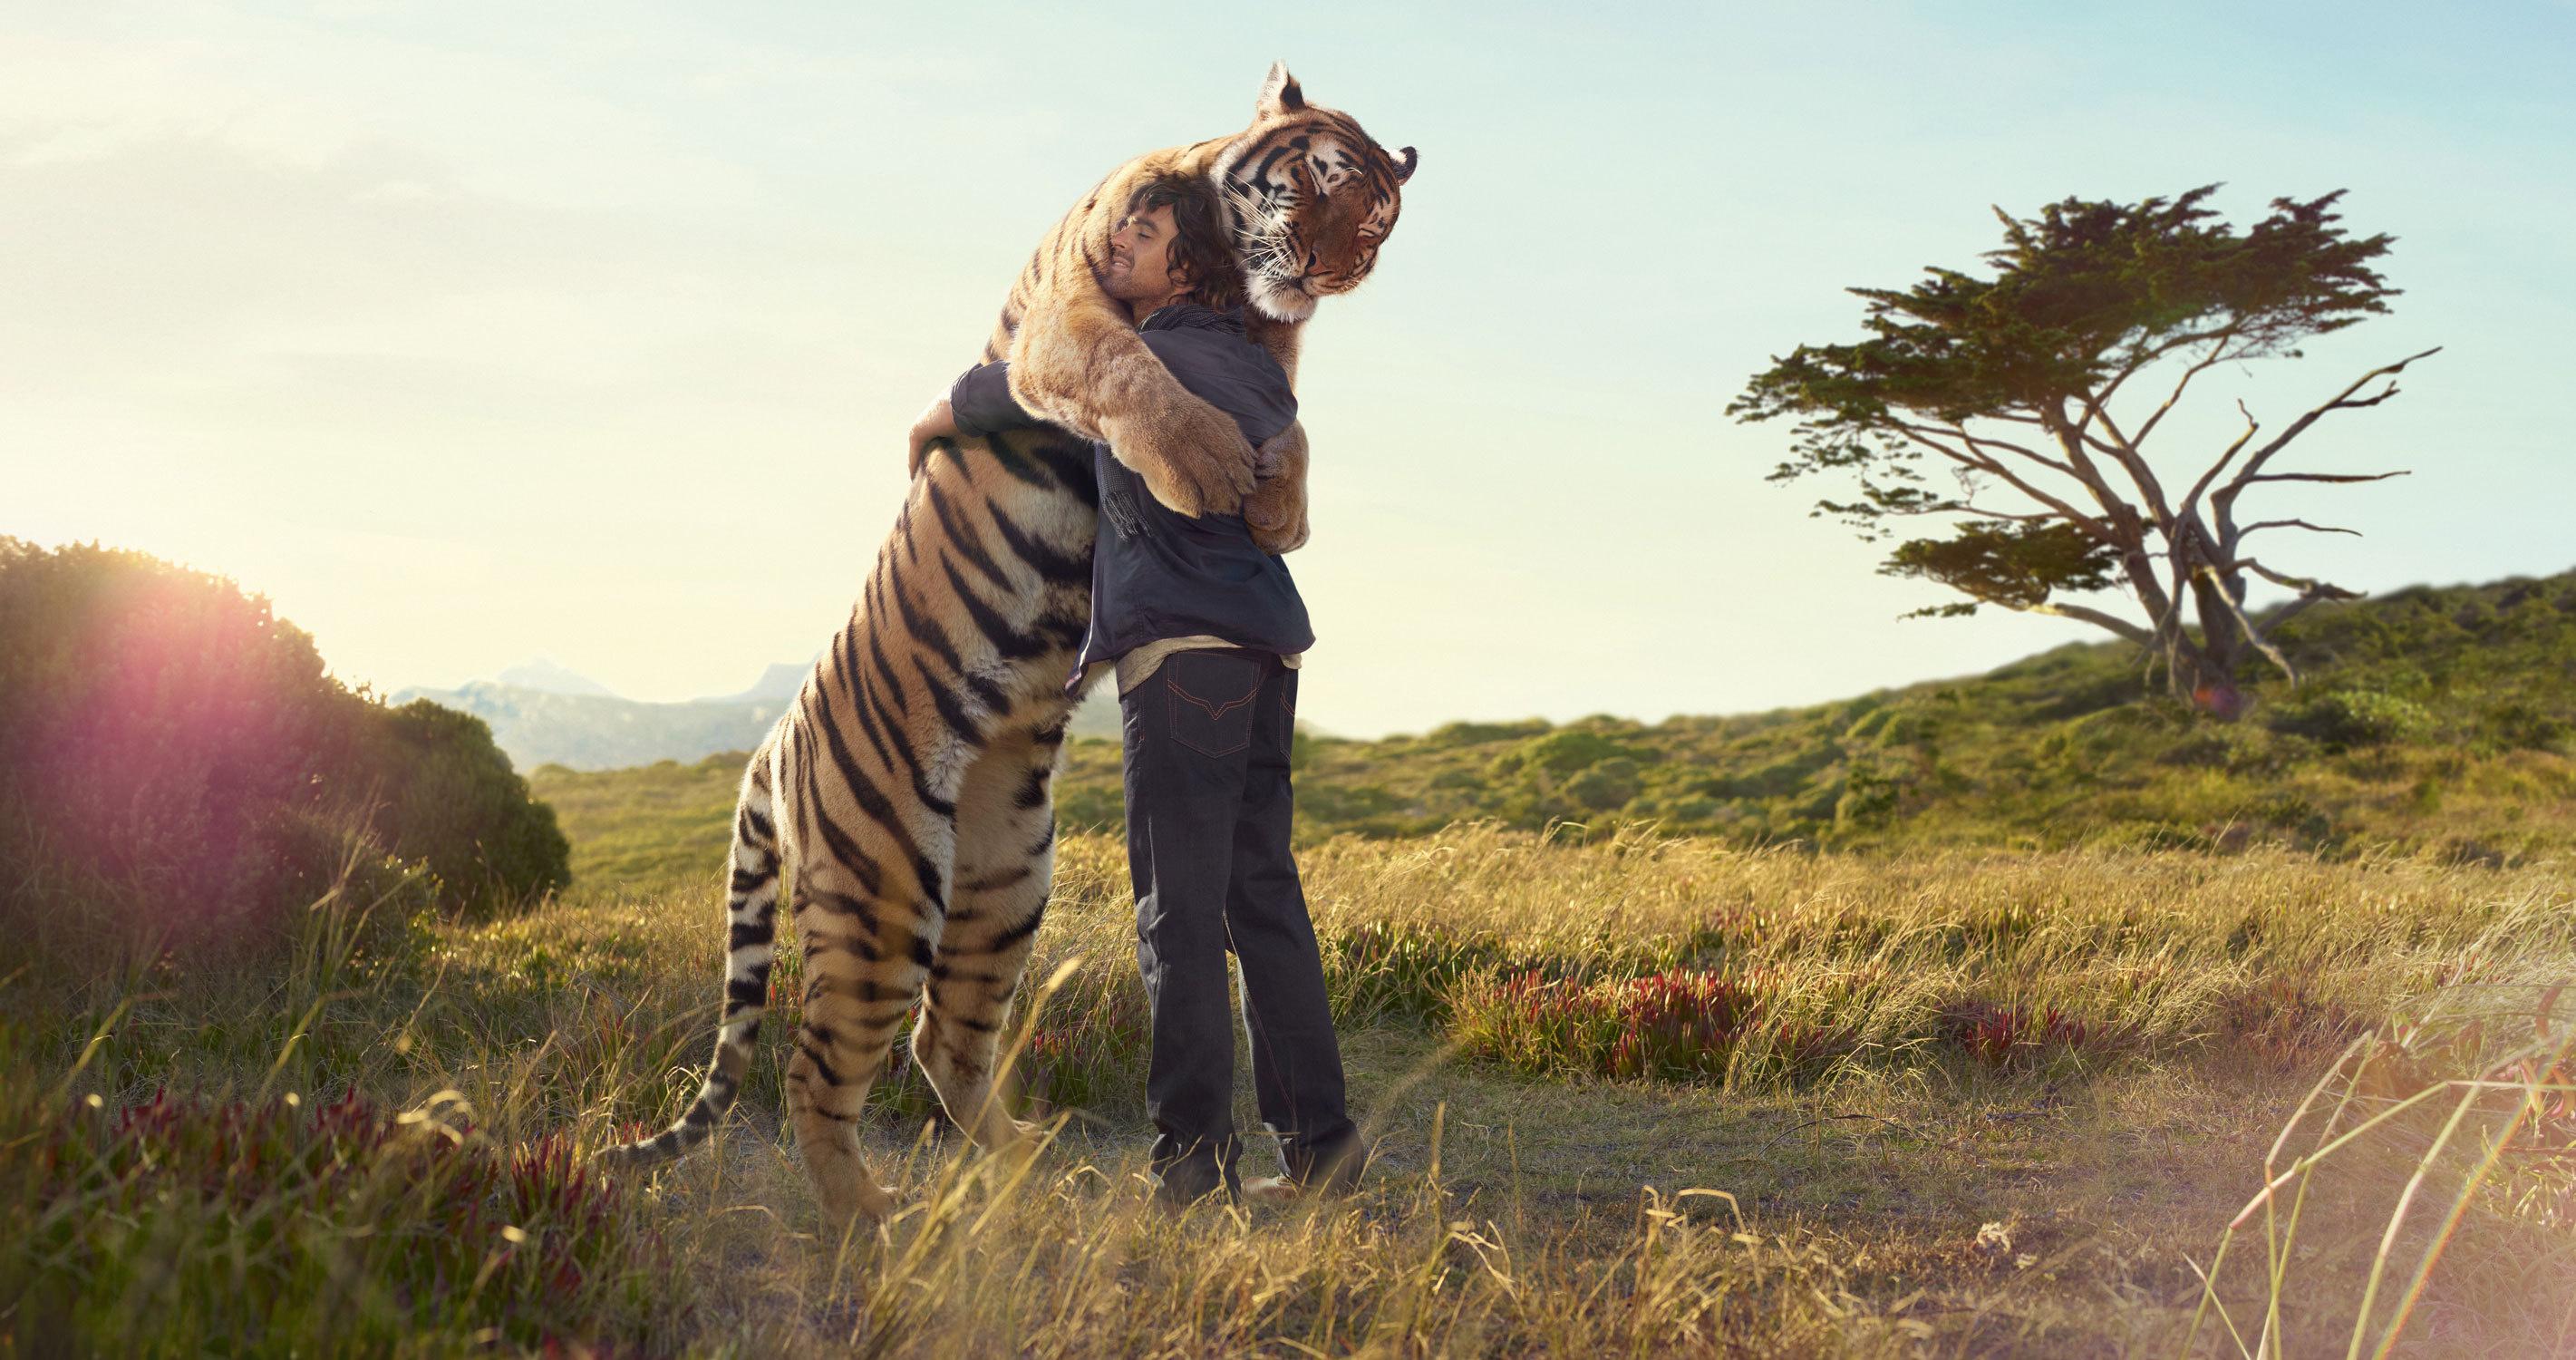 16400 descargar fondo de pantalla Animales, Personas, Tigres: protectores de pantalla e imágenes gratis